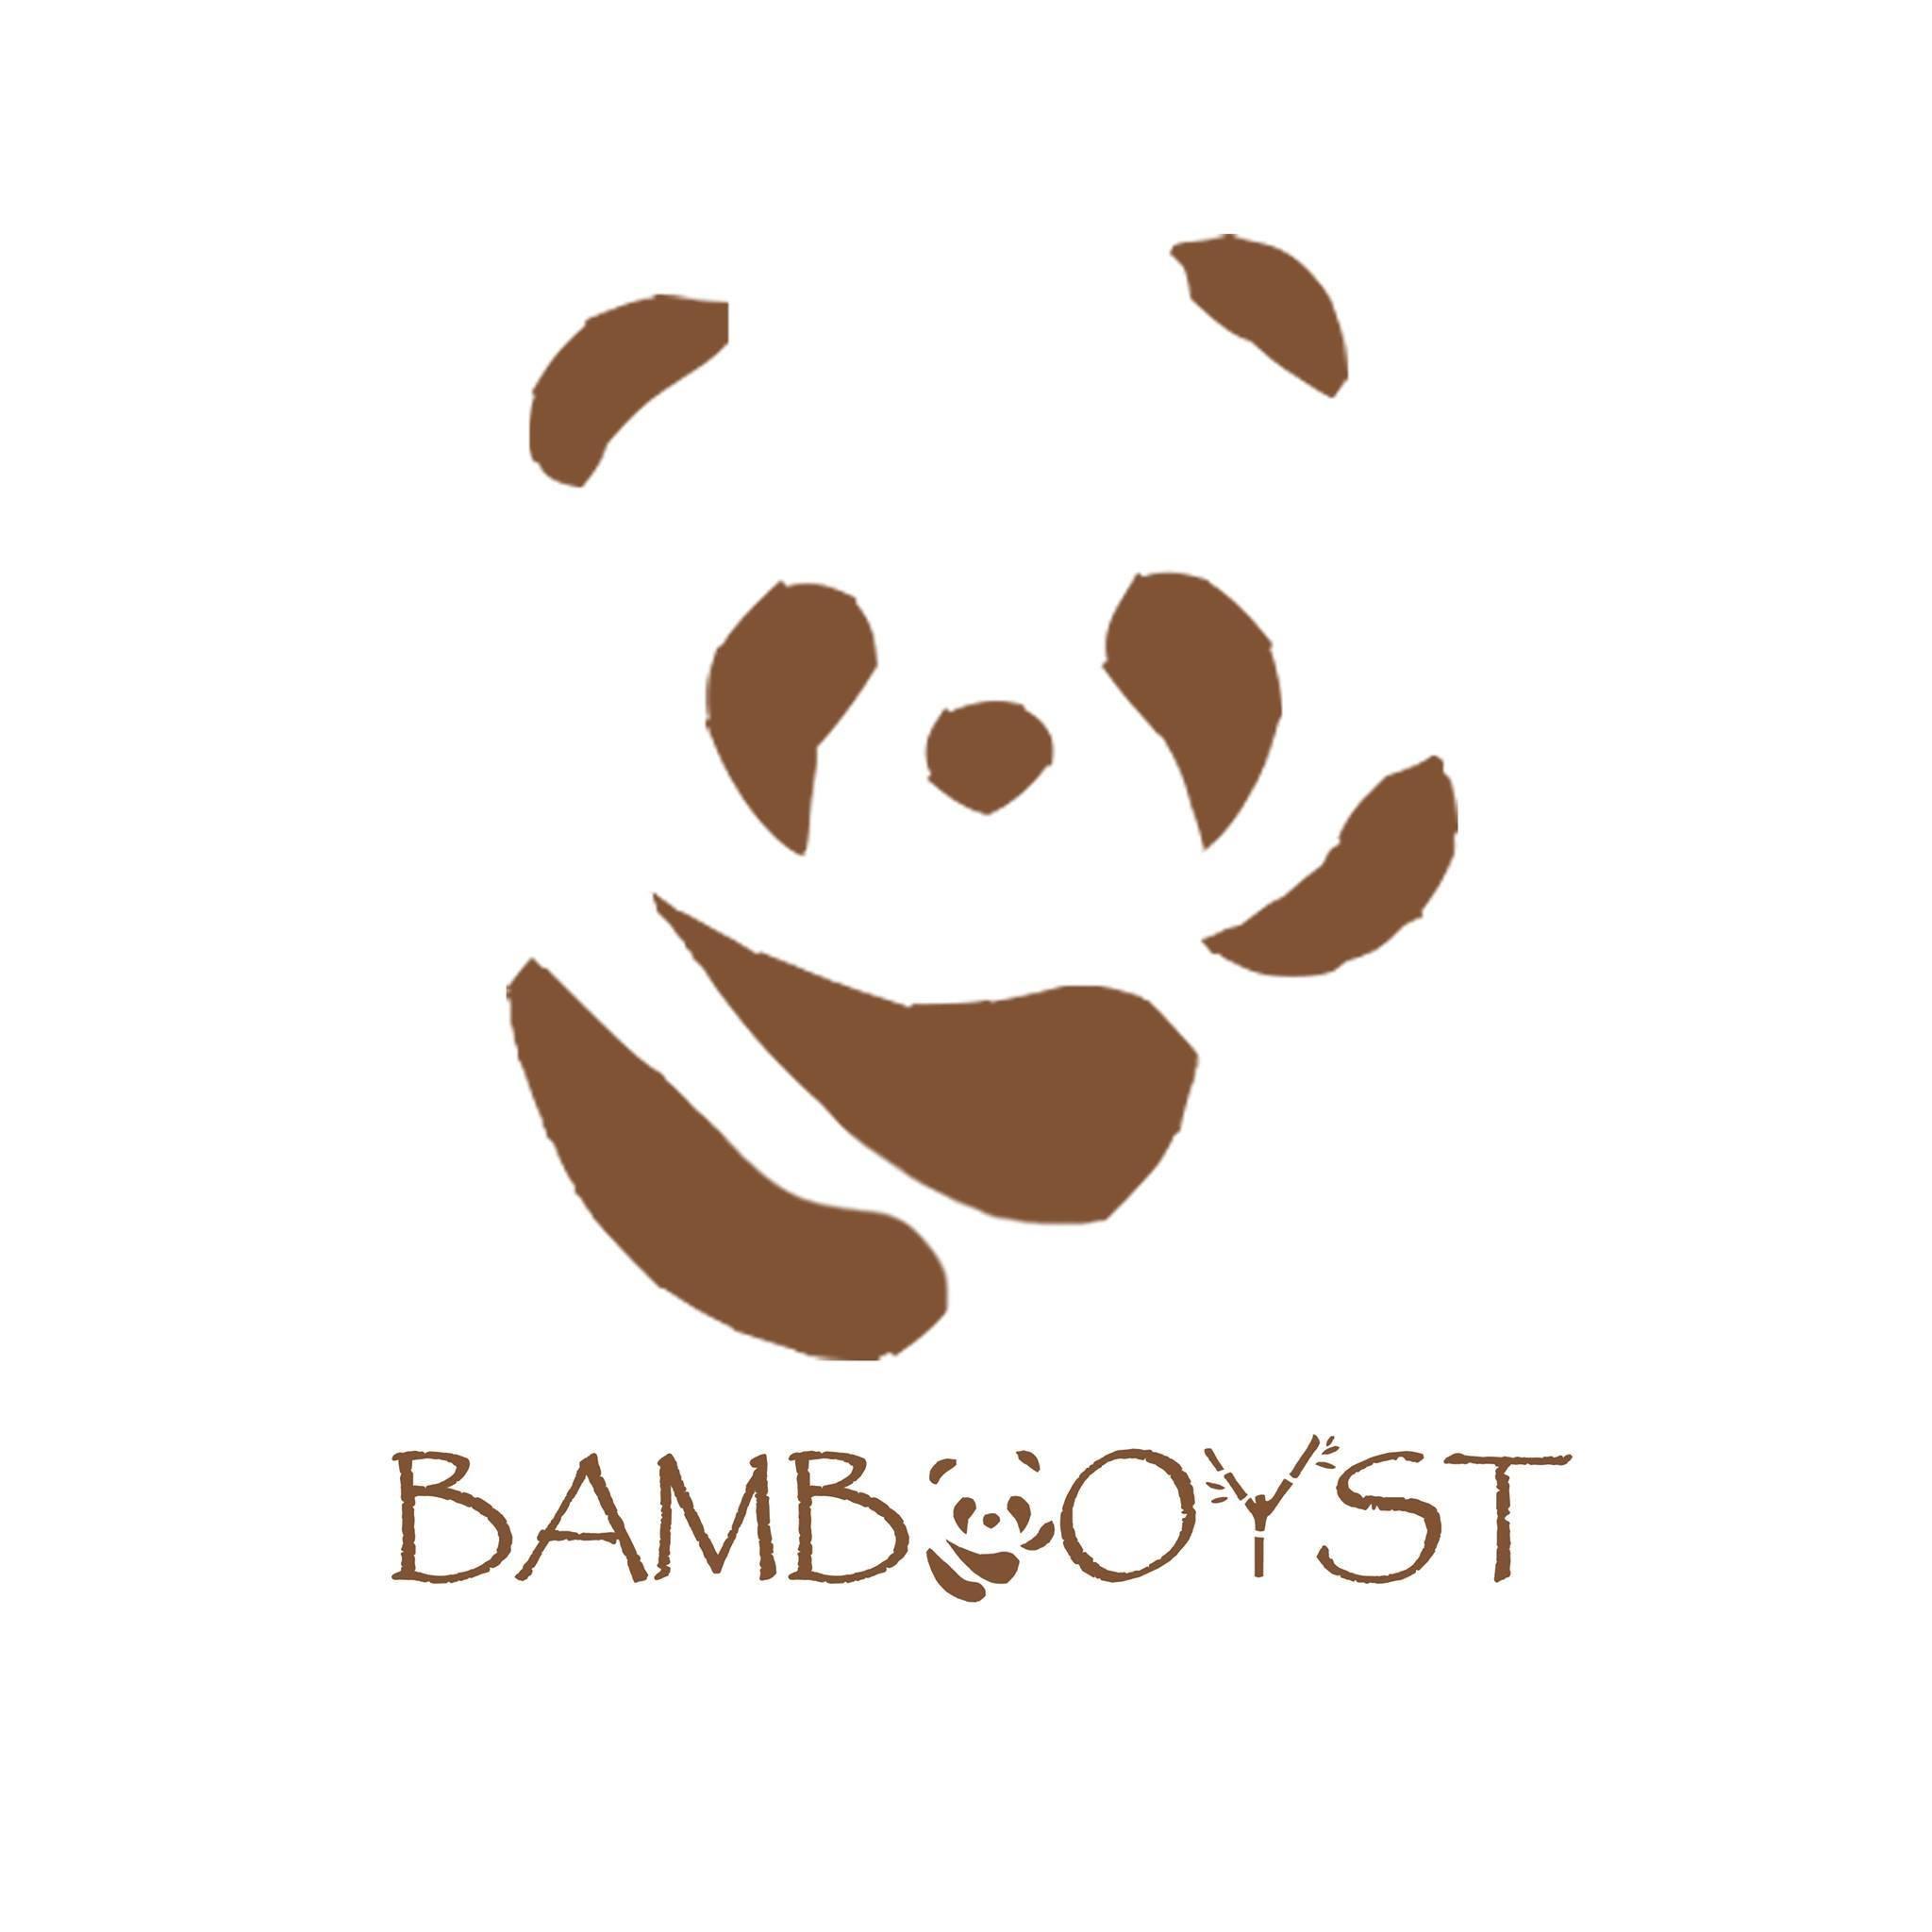 bambooyst